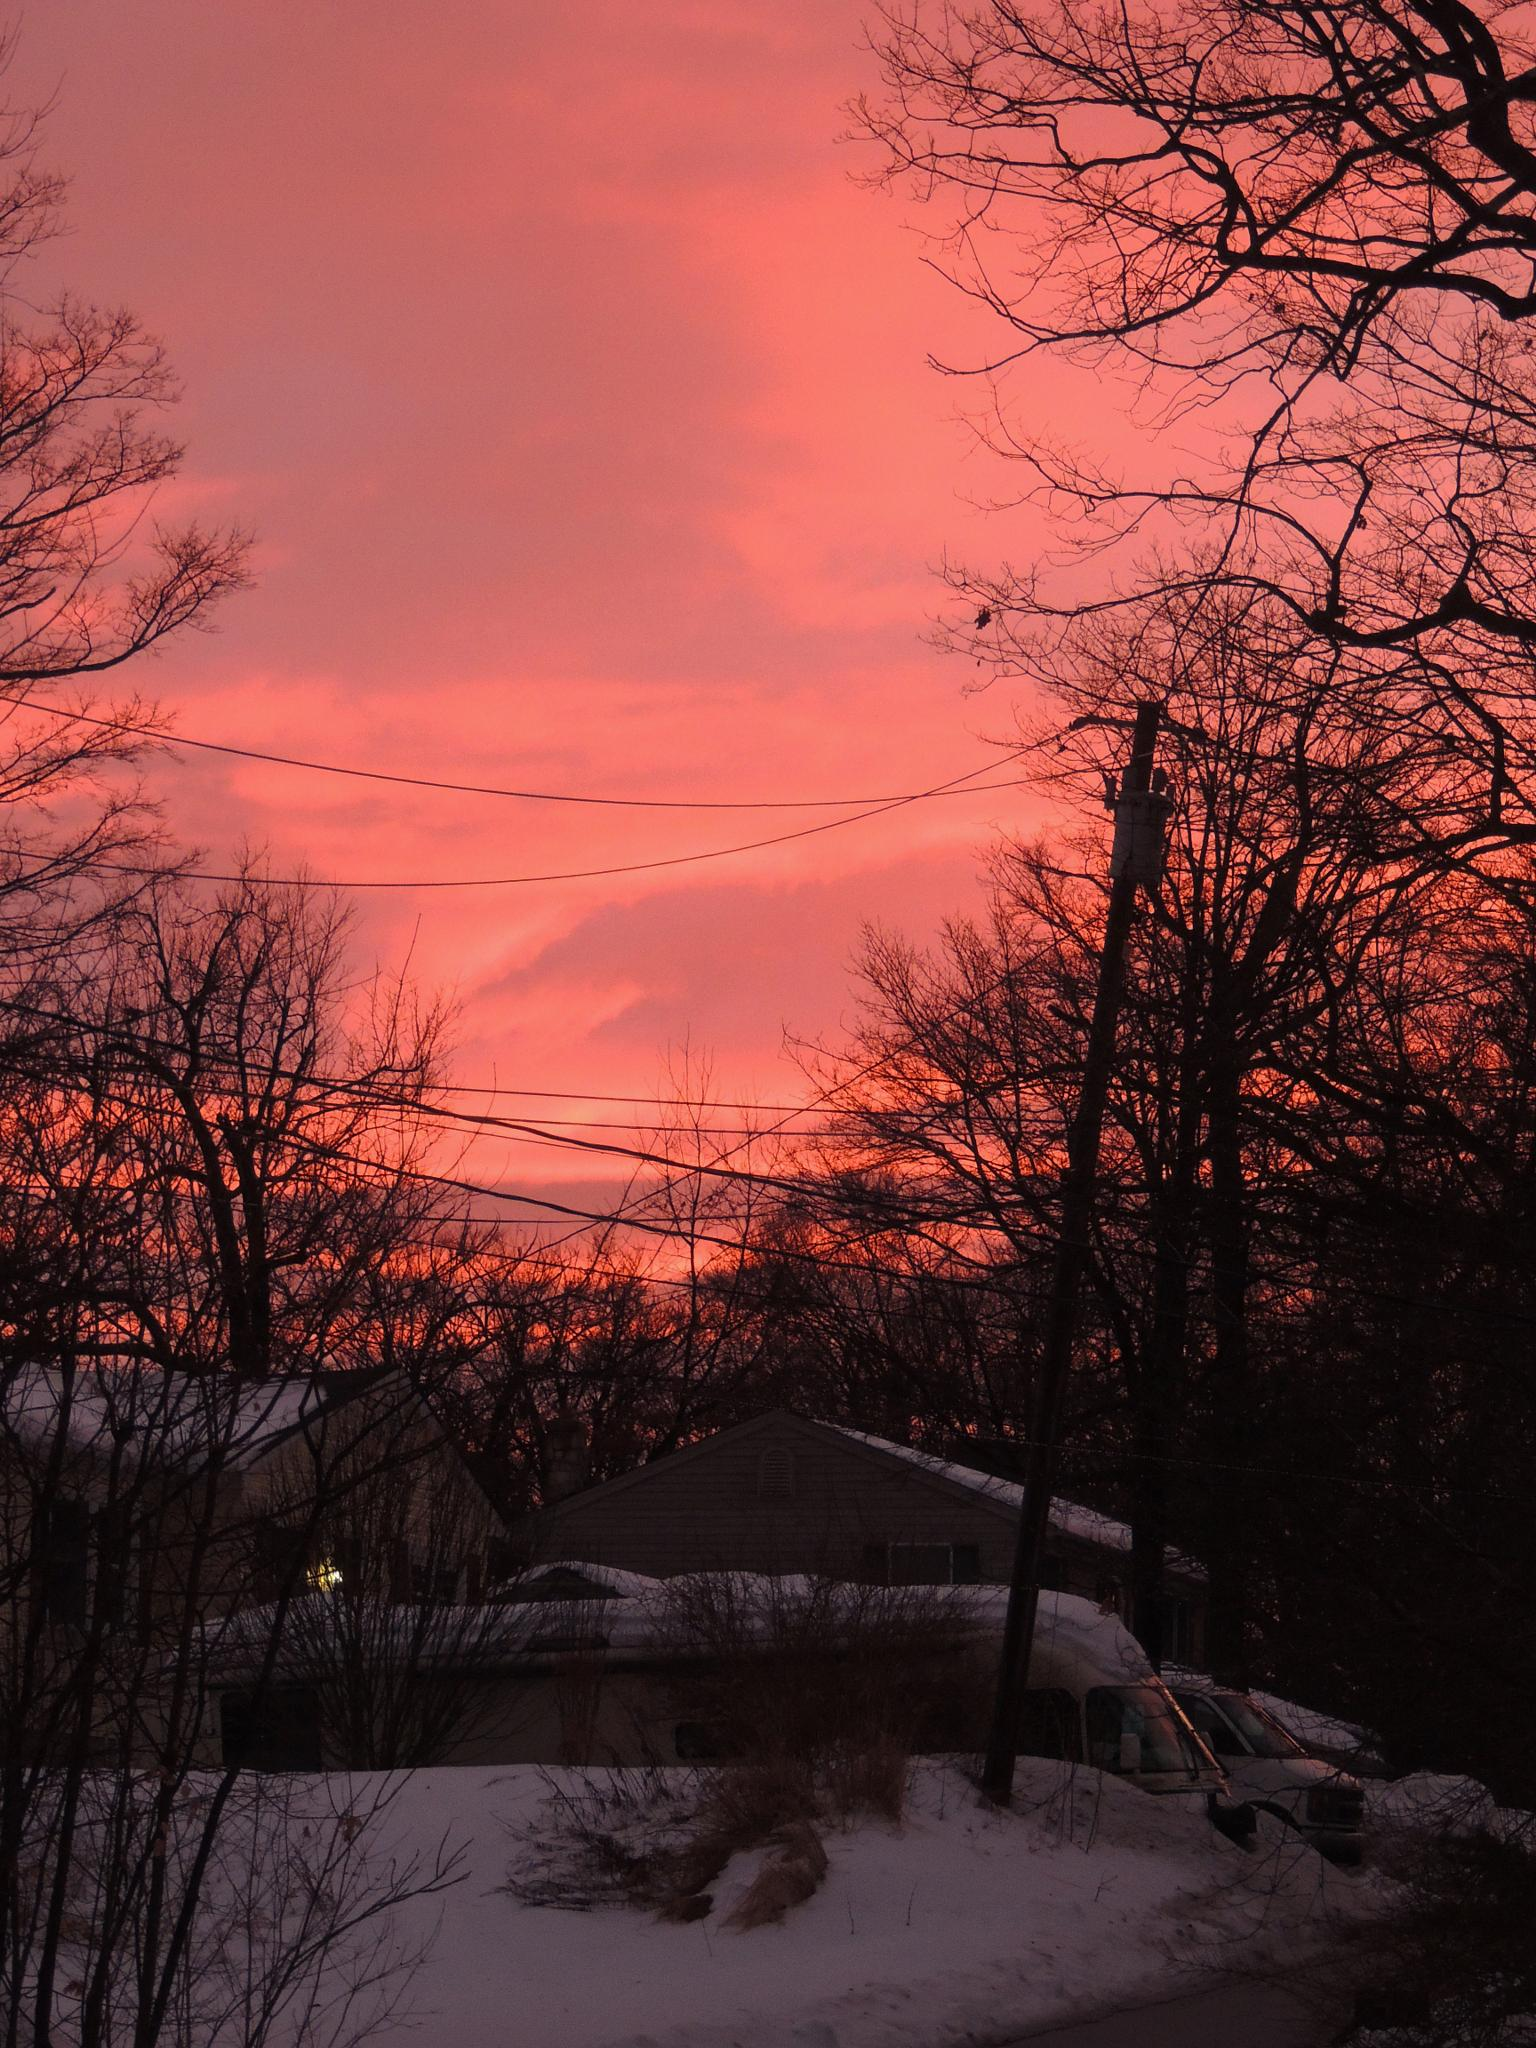 Pink skies by carol.capozzi.18